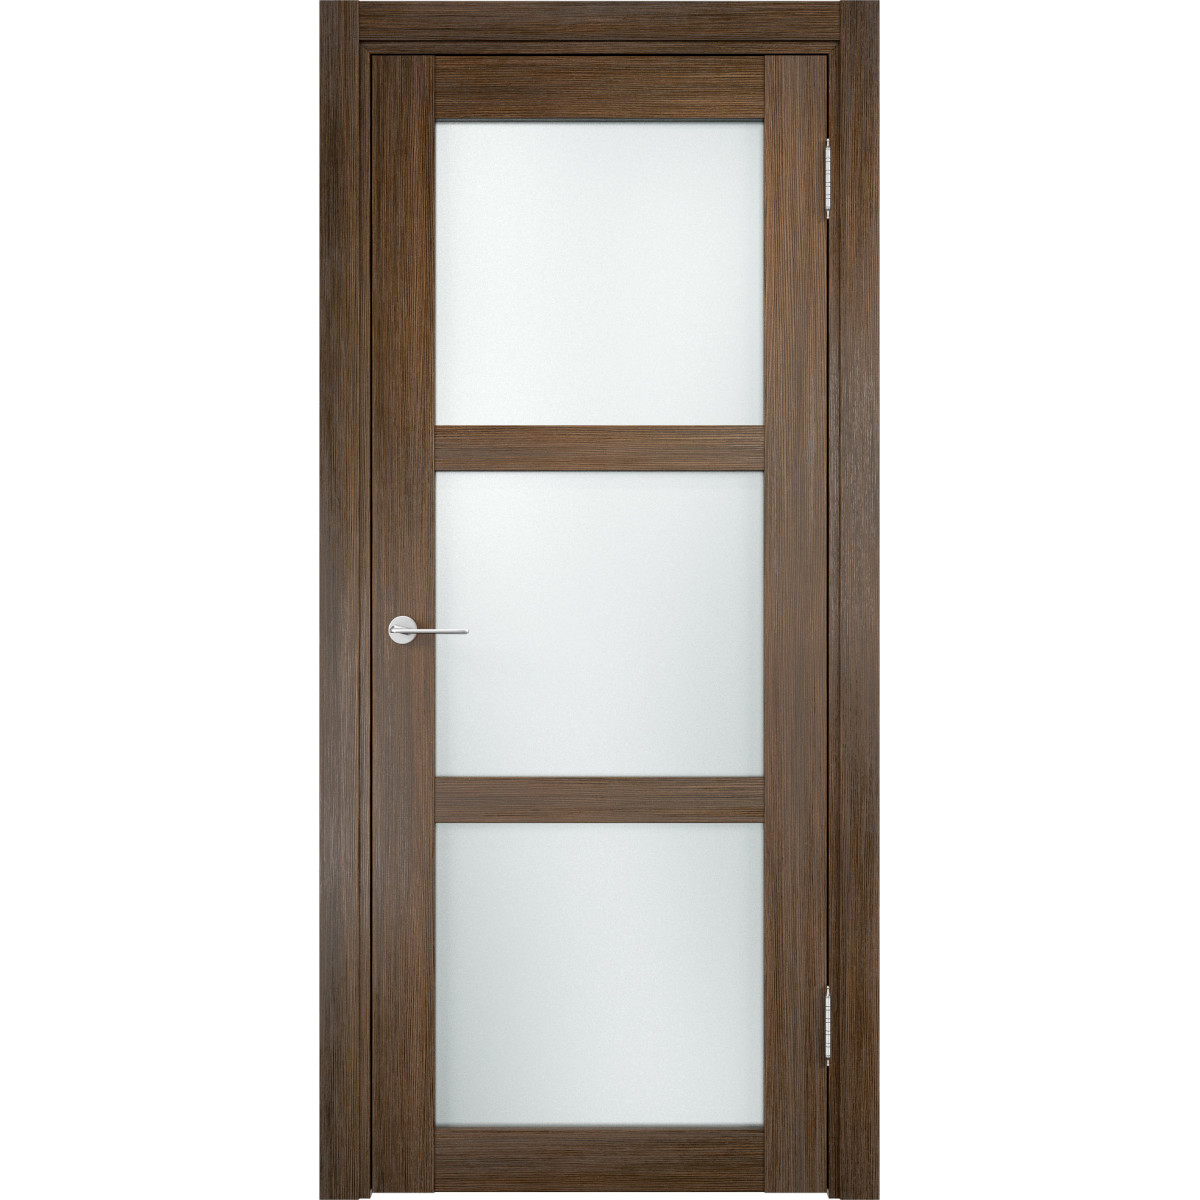 Дверное полотно Casaporte Рома МП_0113 2000х900х44 мм МДФ